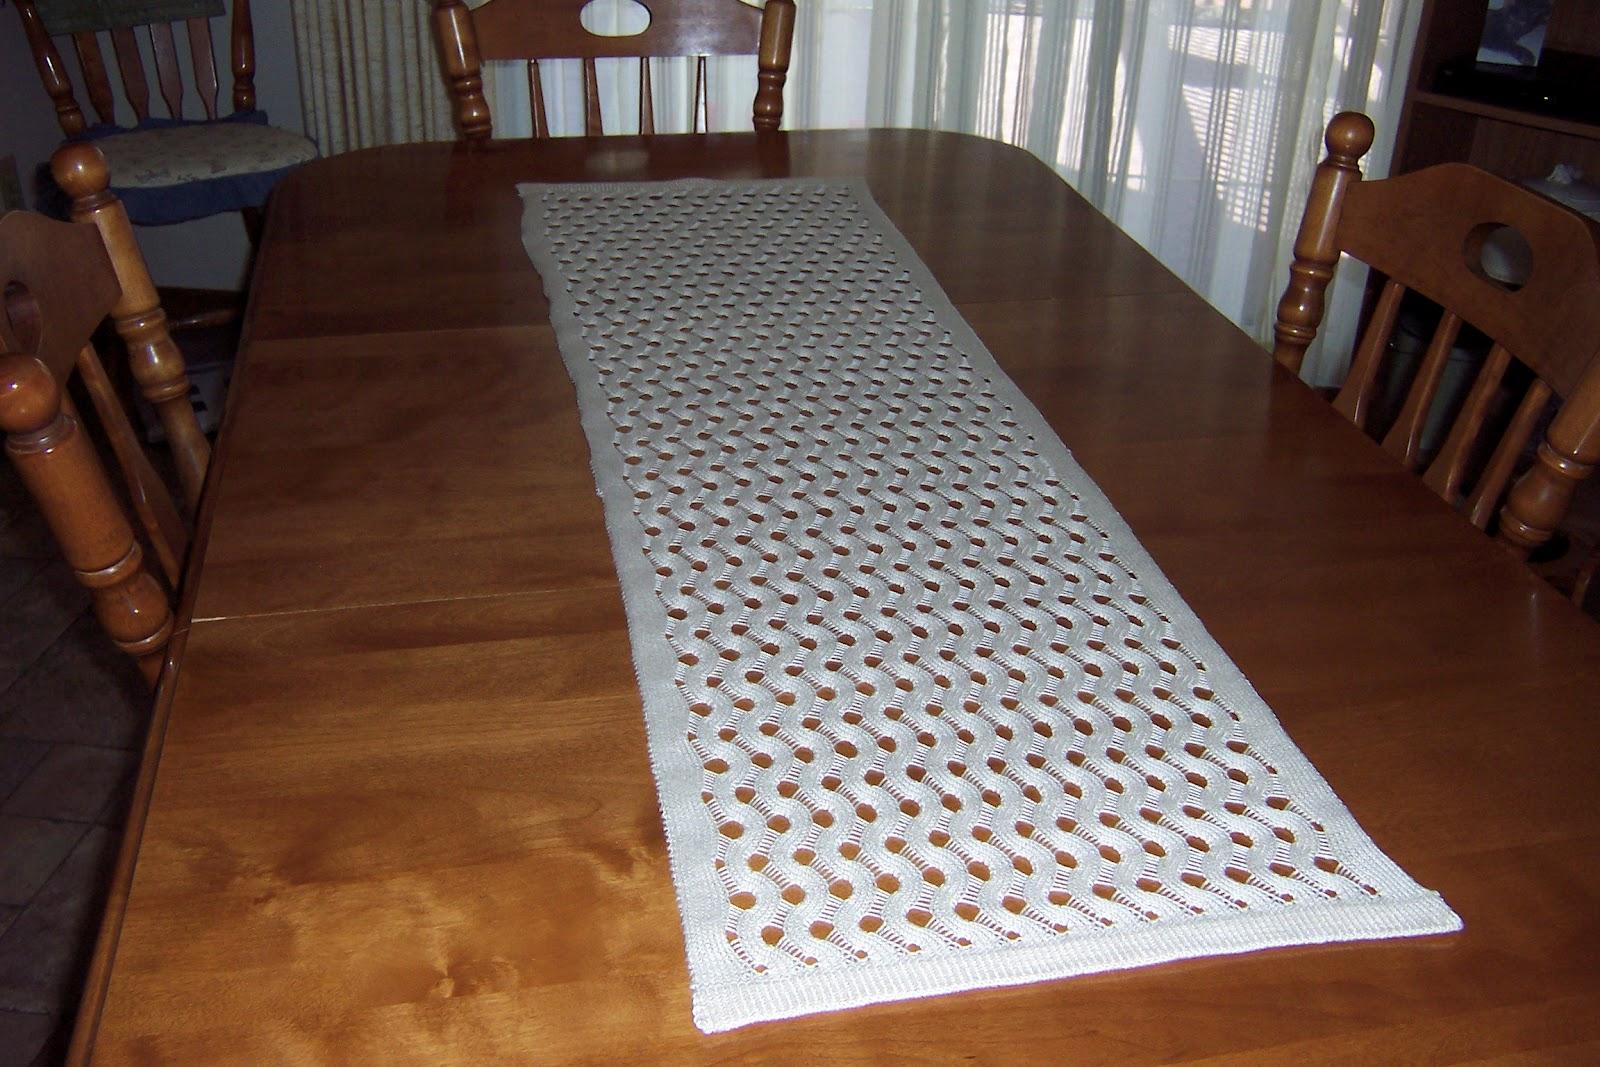 Marg 39 s knitting place table runner project for Table runner